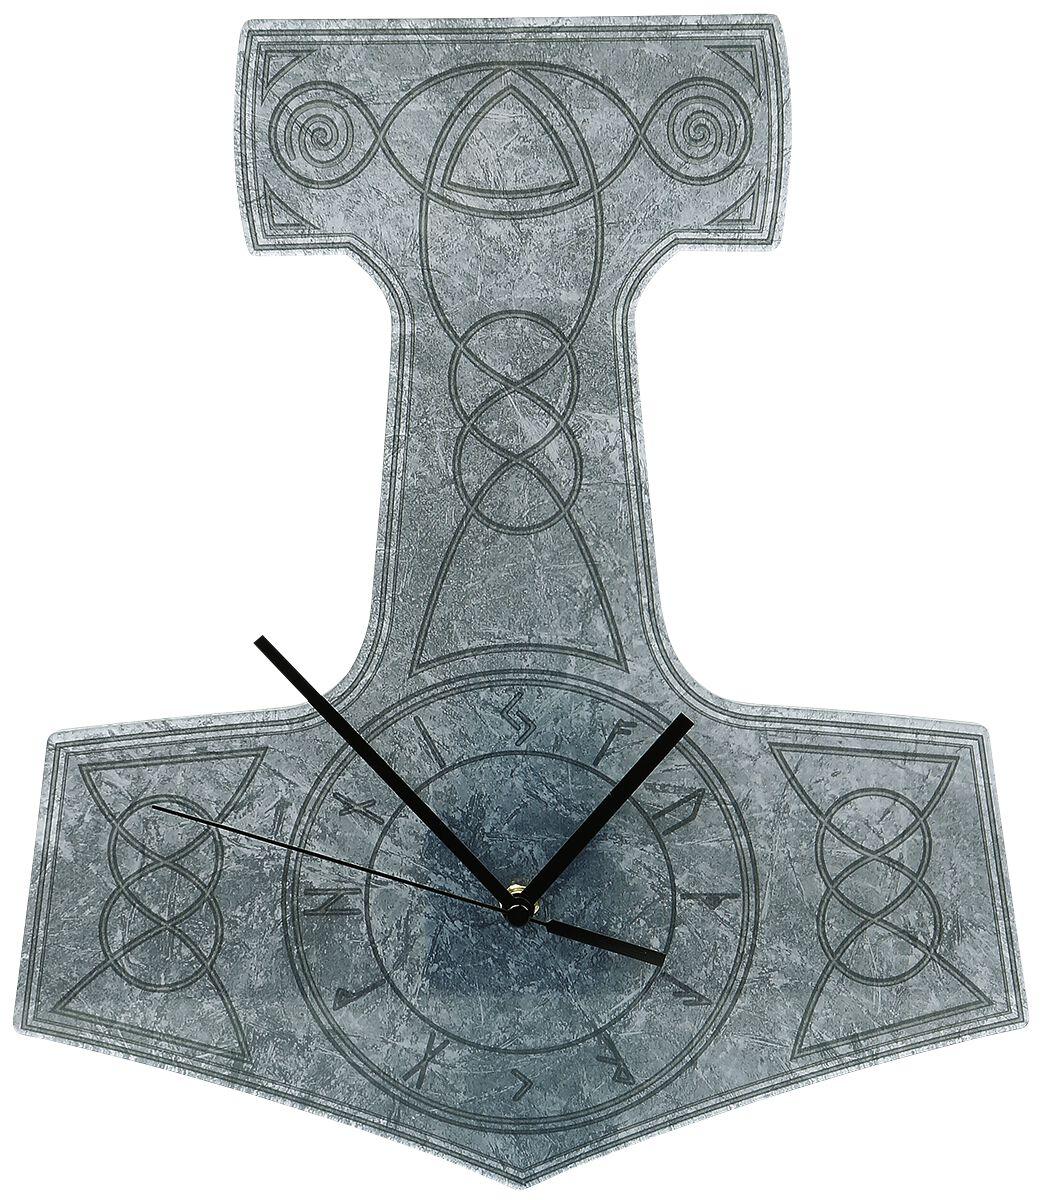 Image of Acryl-Wanduhr Thor's Hammer Wanduhr grau